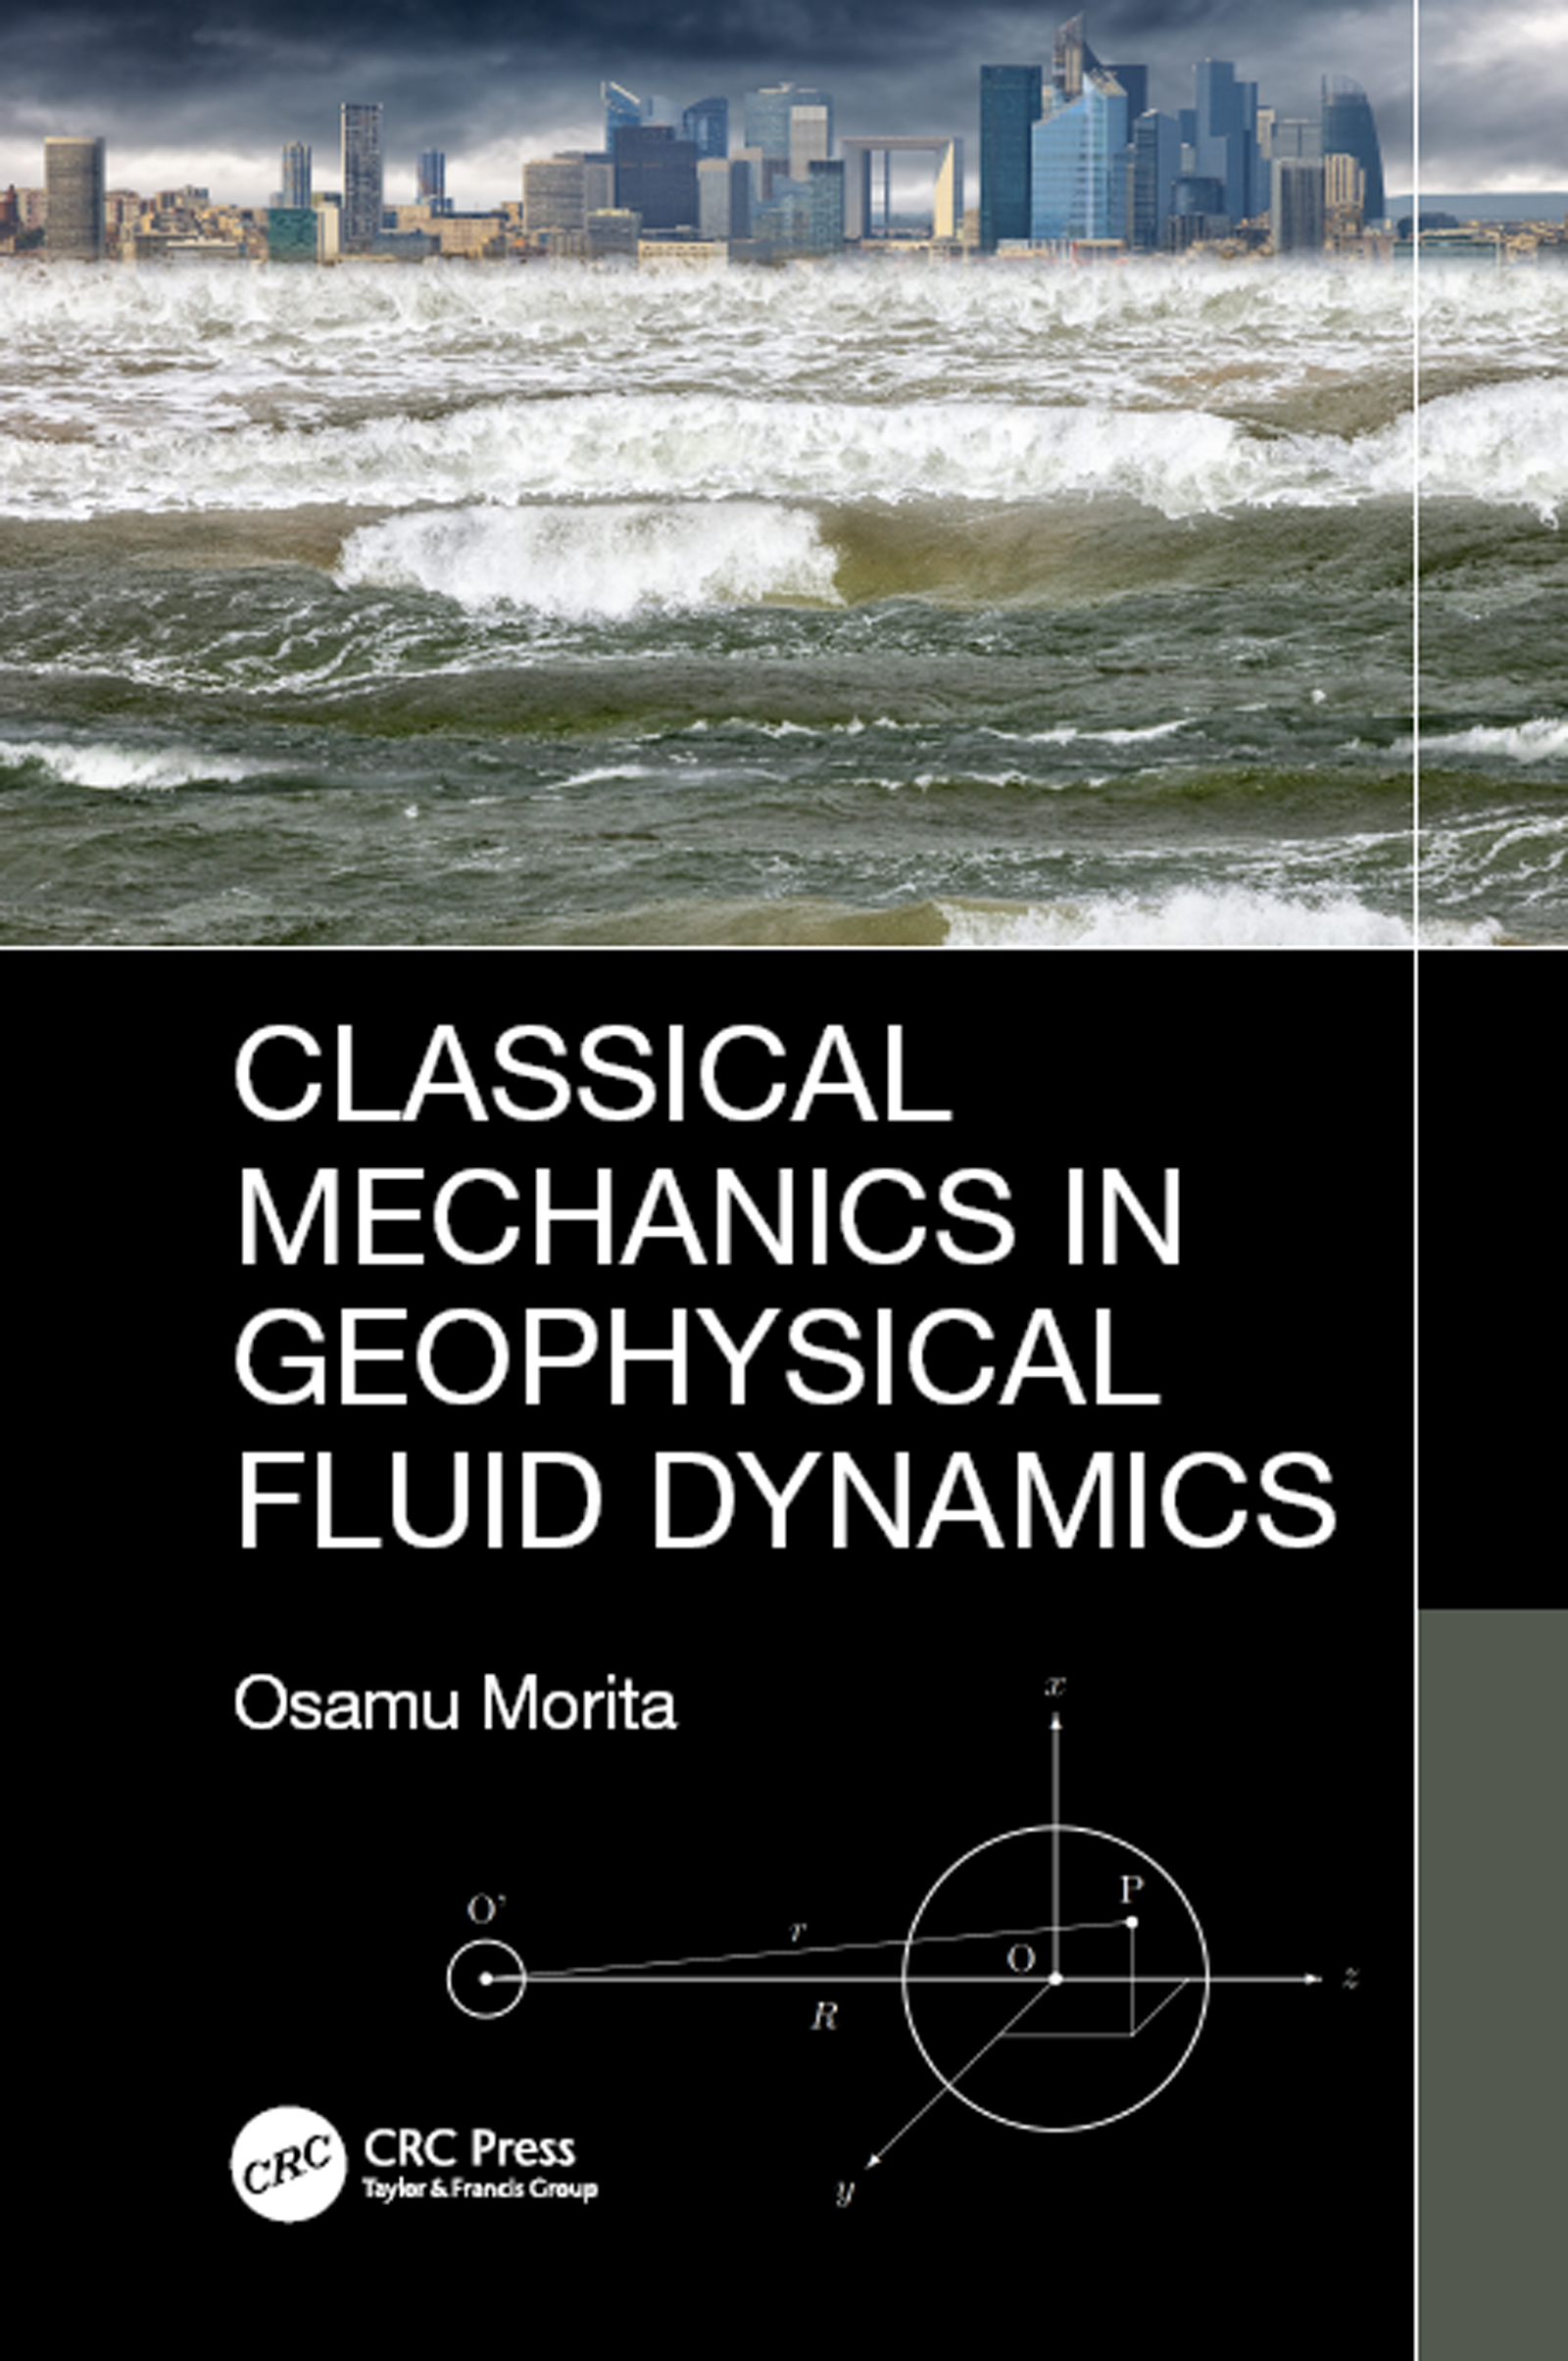 Classical Mechanics in Geophysical Fluid Dynamics book cover